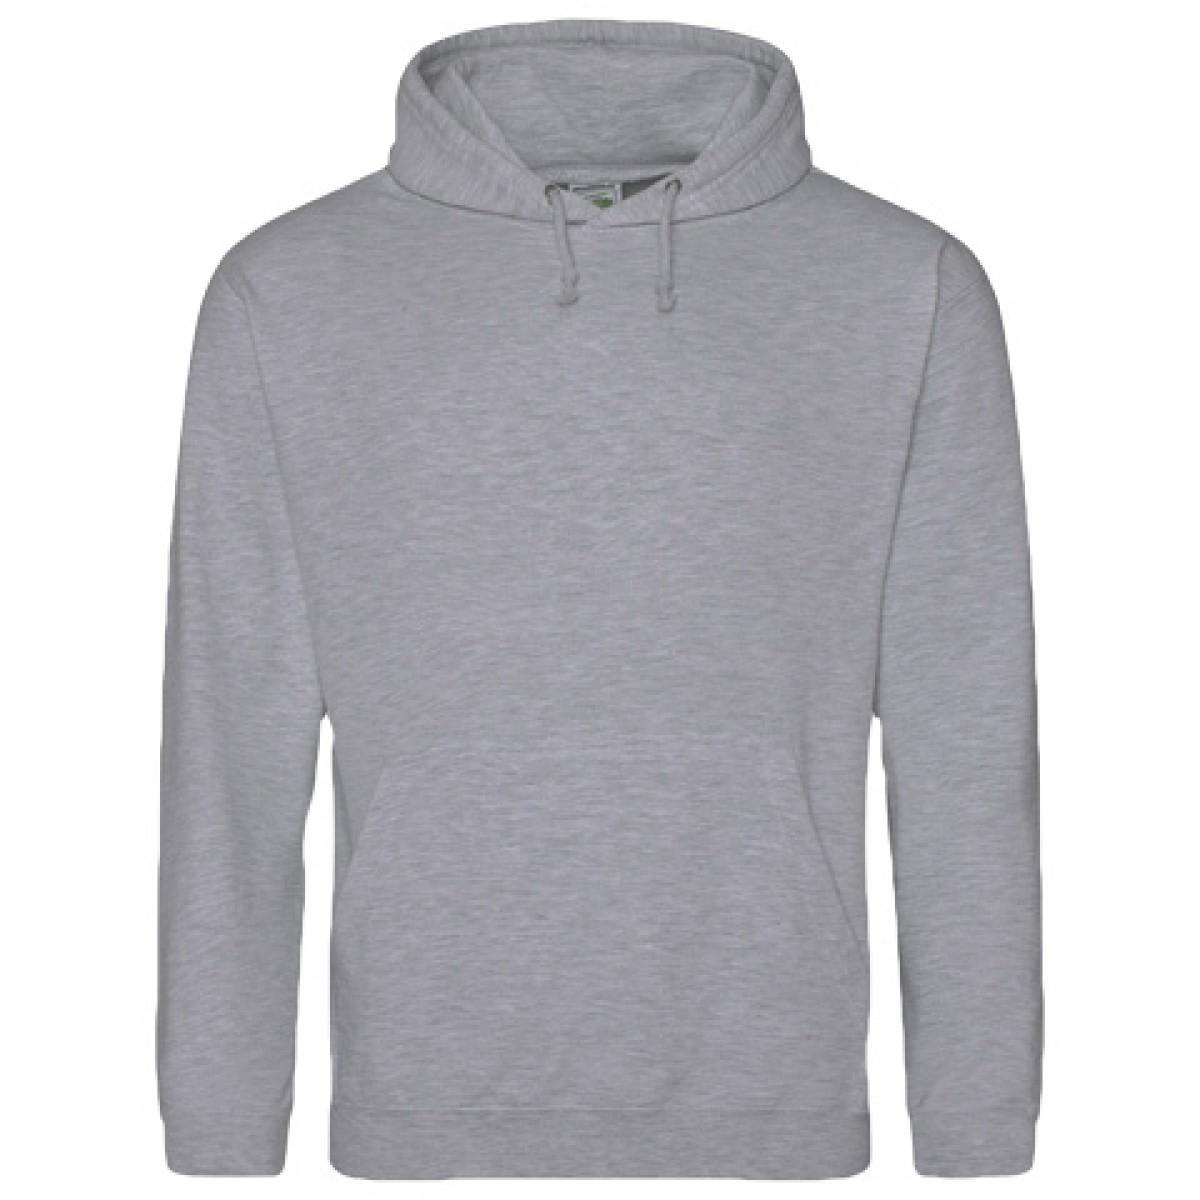 Hooded Sweatshirt 50/50 Heavy Blend-Gray-YL